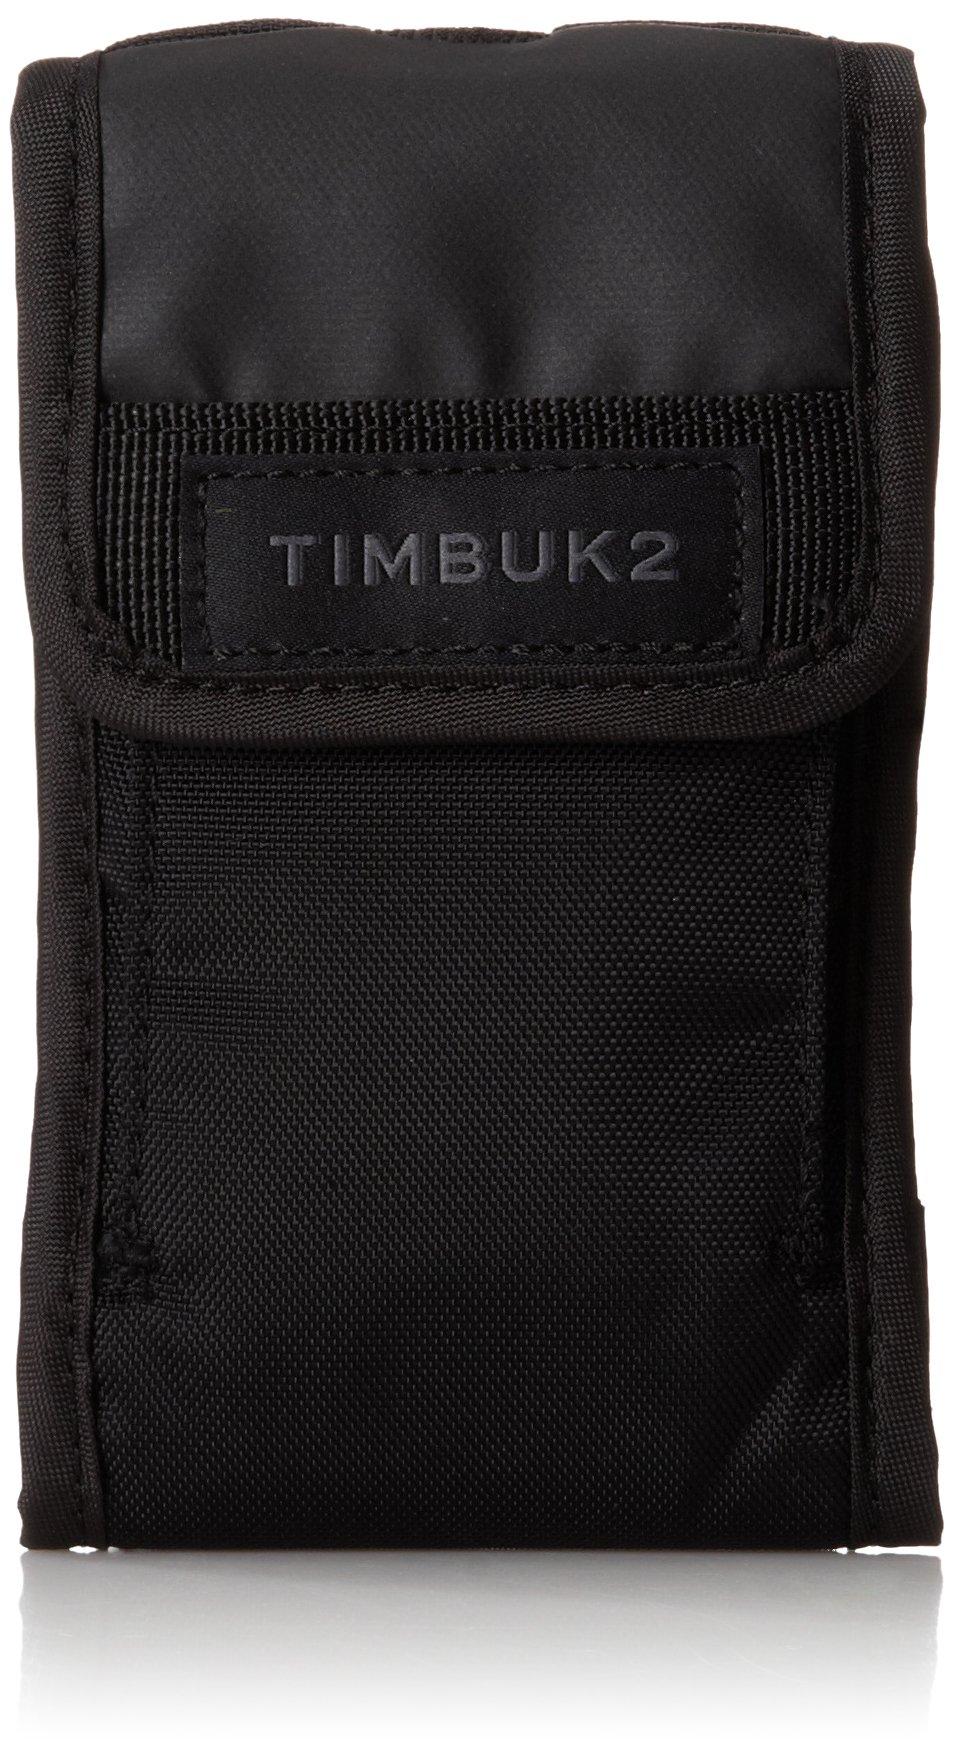 Timbuk2 3 Way Case, Black, Medium by Timbuk2